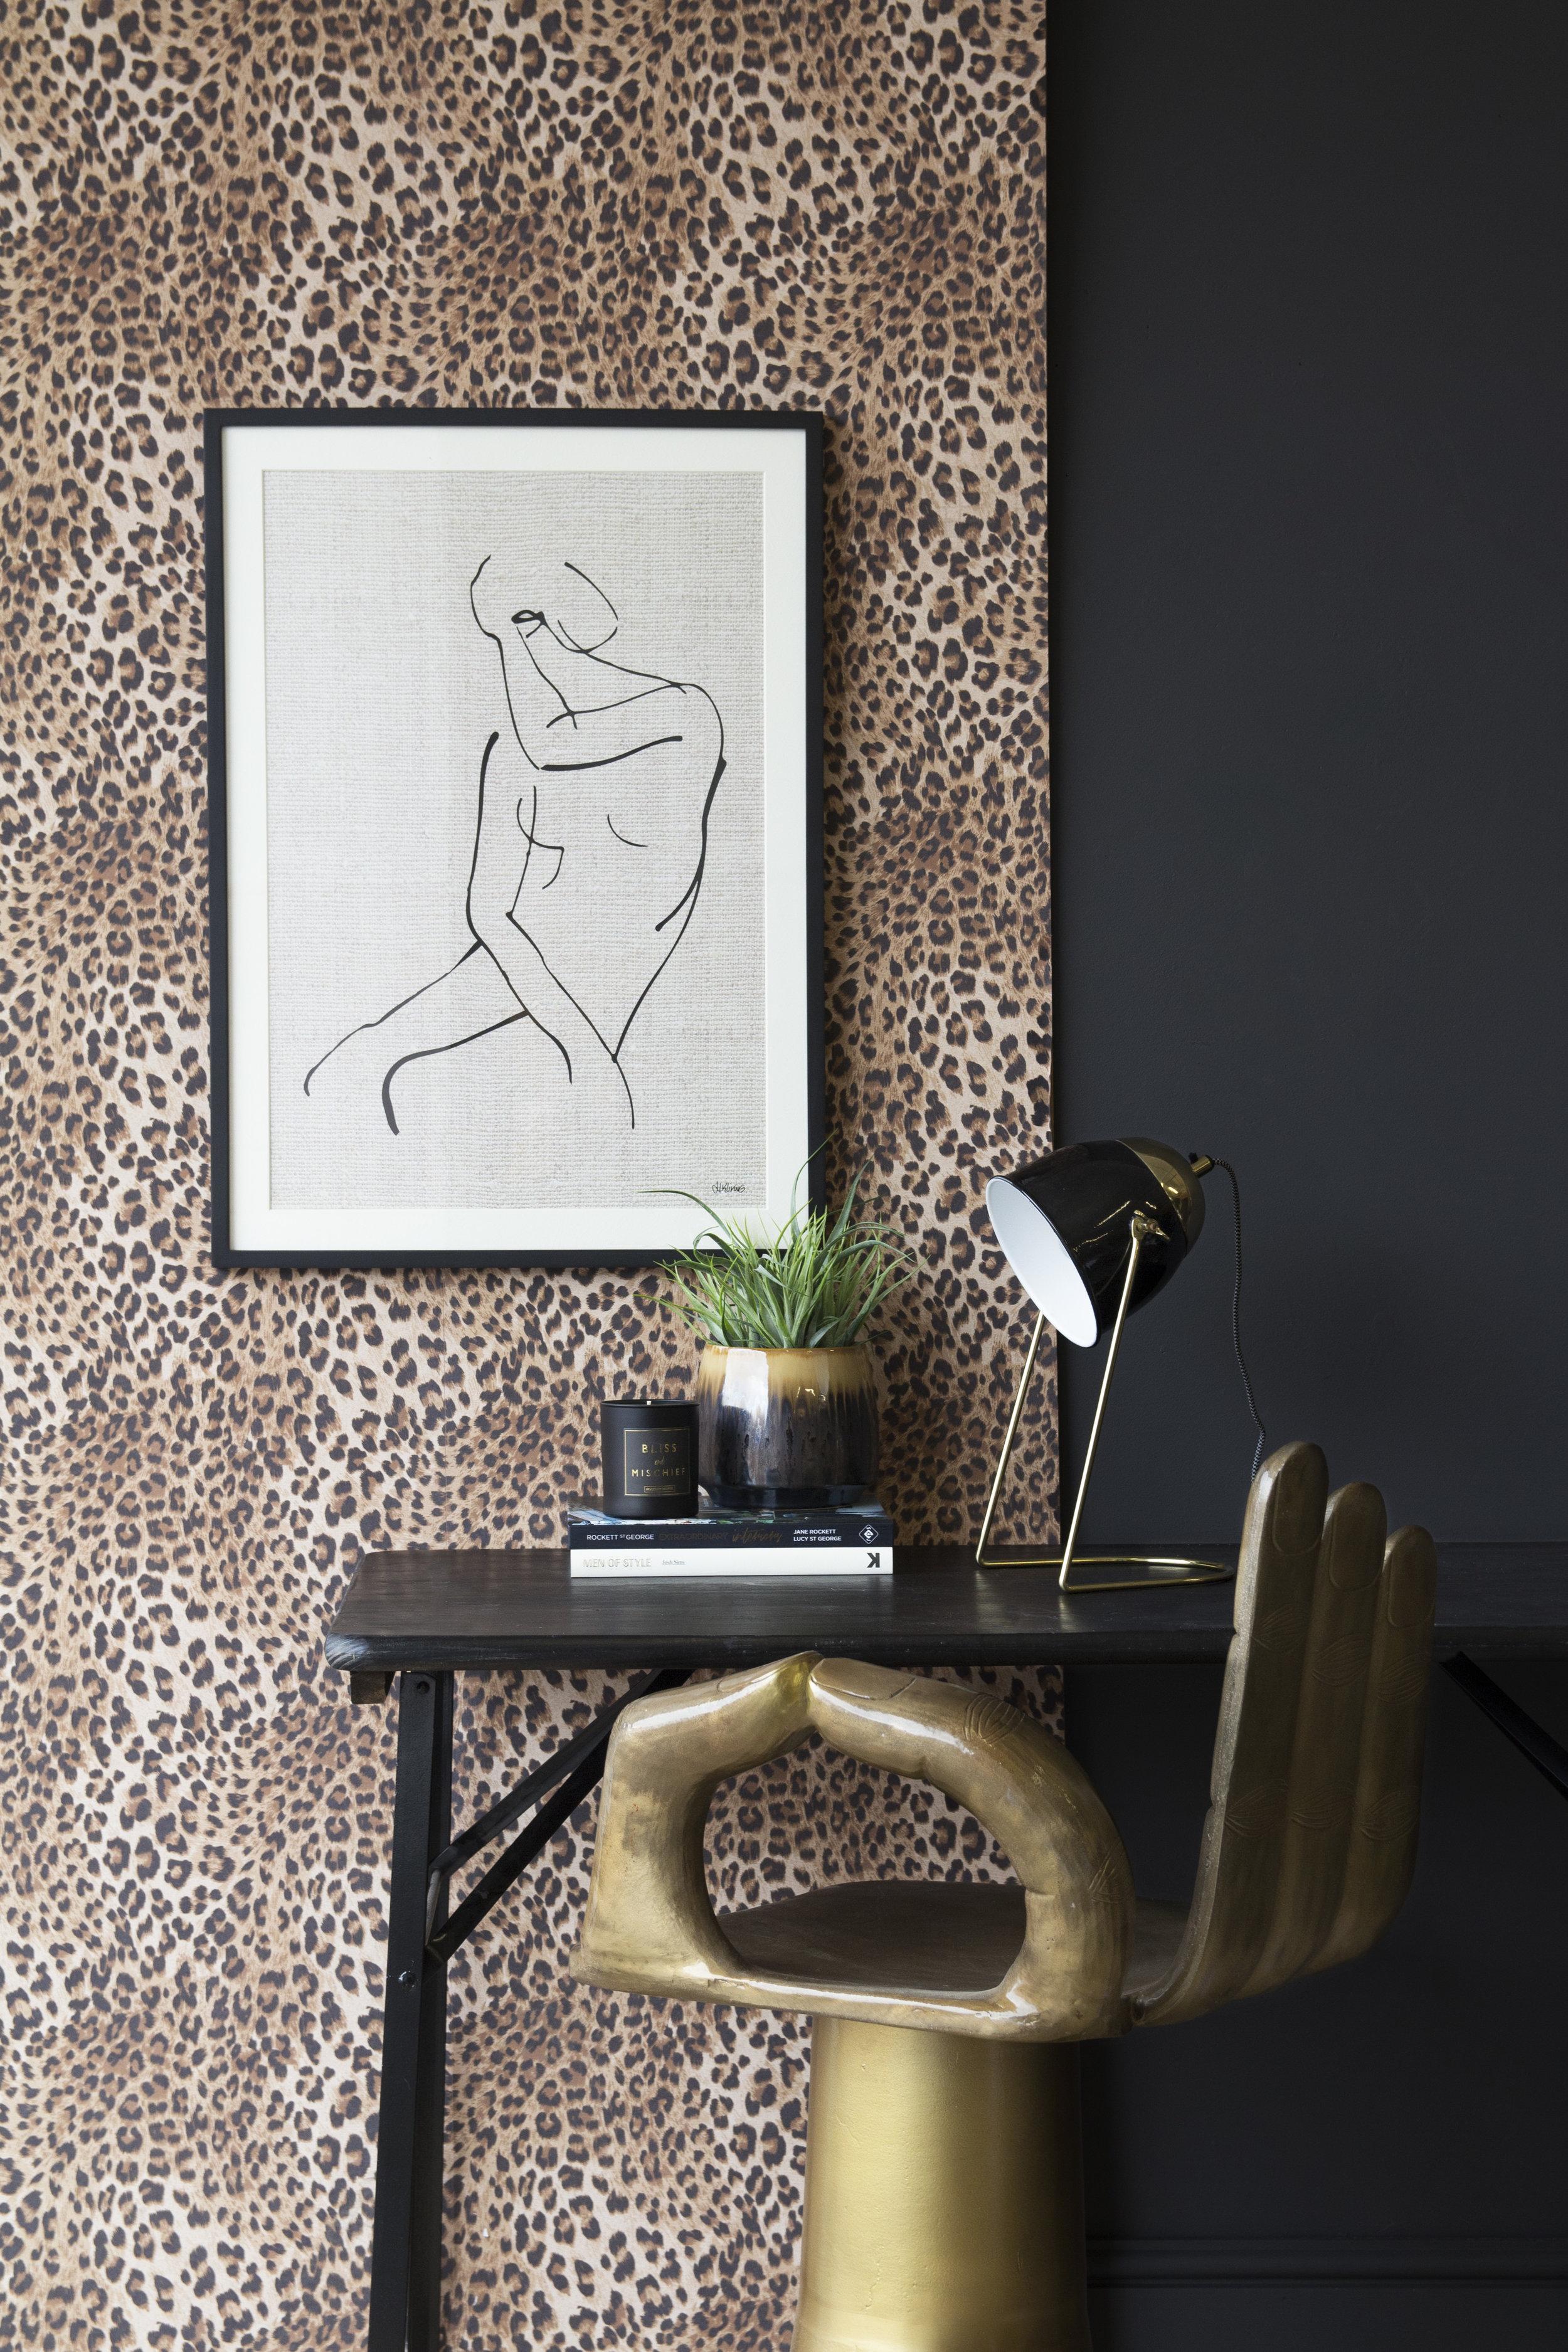 rockettstgeorge_leopard_print_hand_chair_desk_lifestyle_highres.jpg